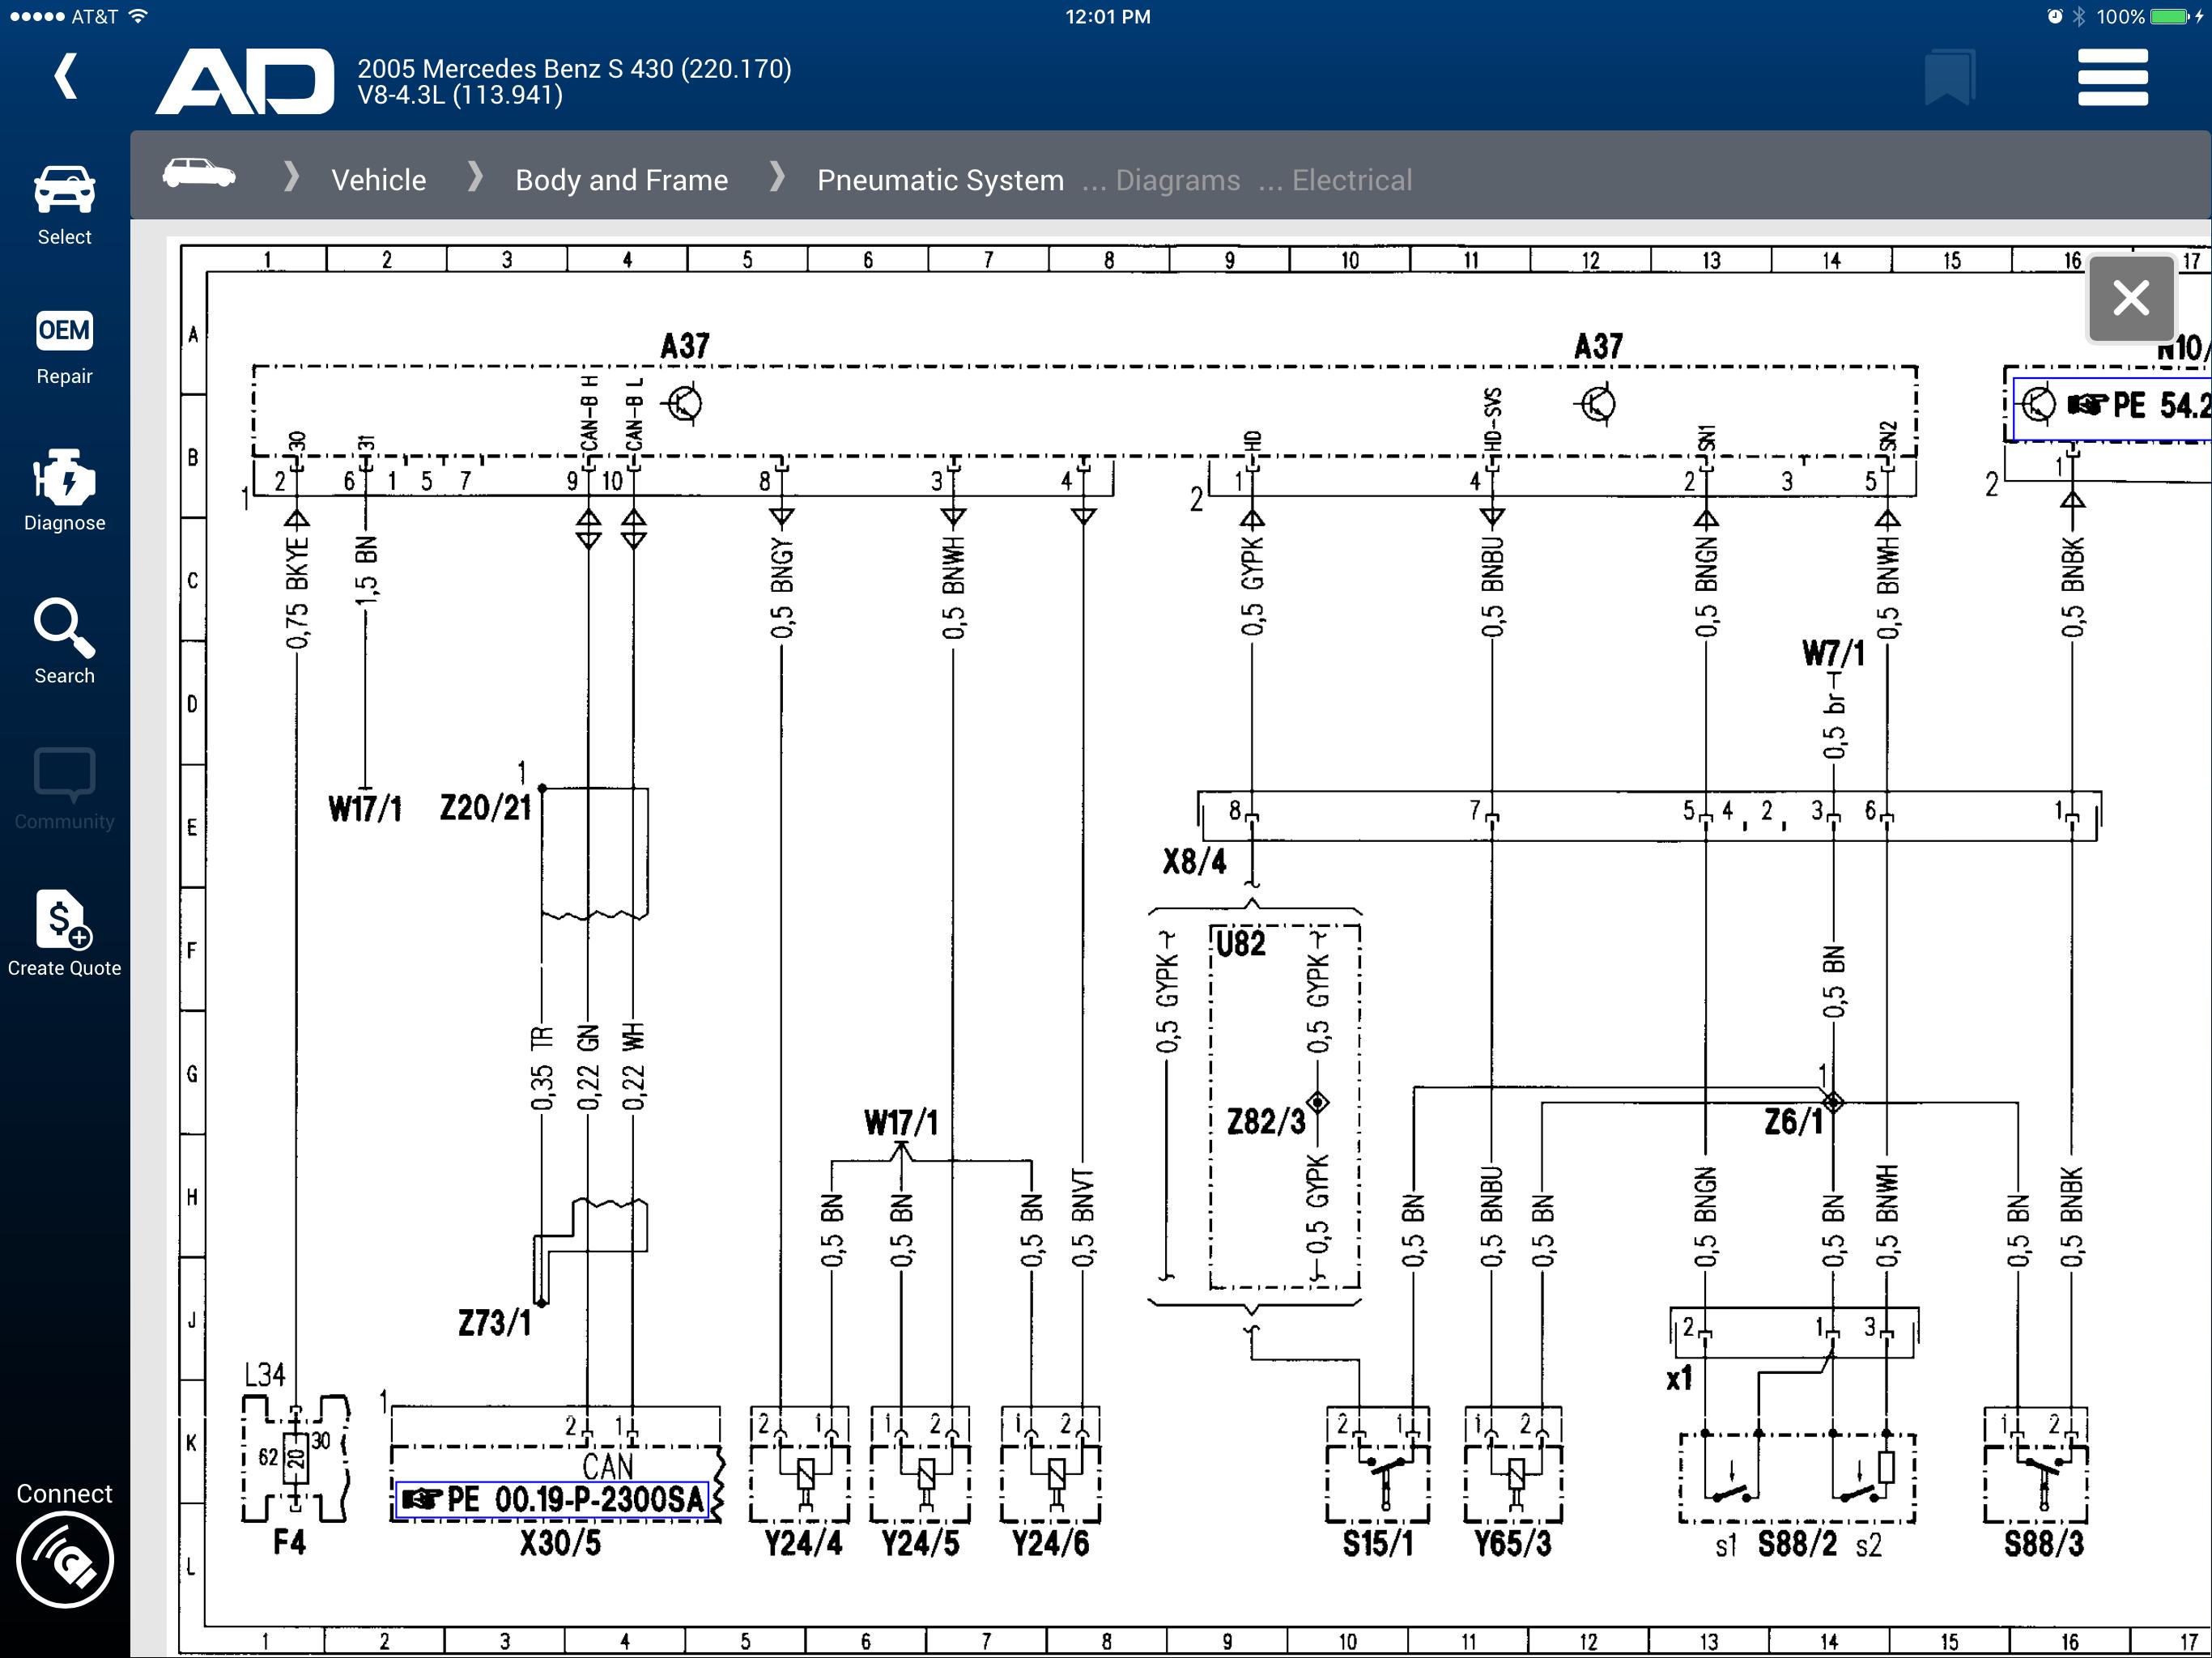 Mercedes Pse Pump Location On 2000 Mercedes S430 Radio Wiring Diagram